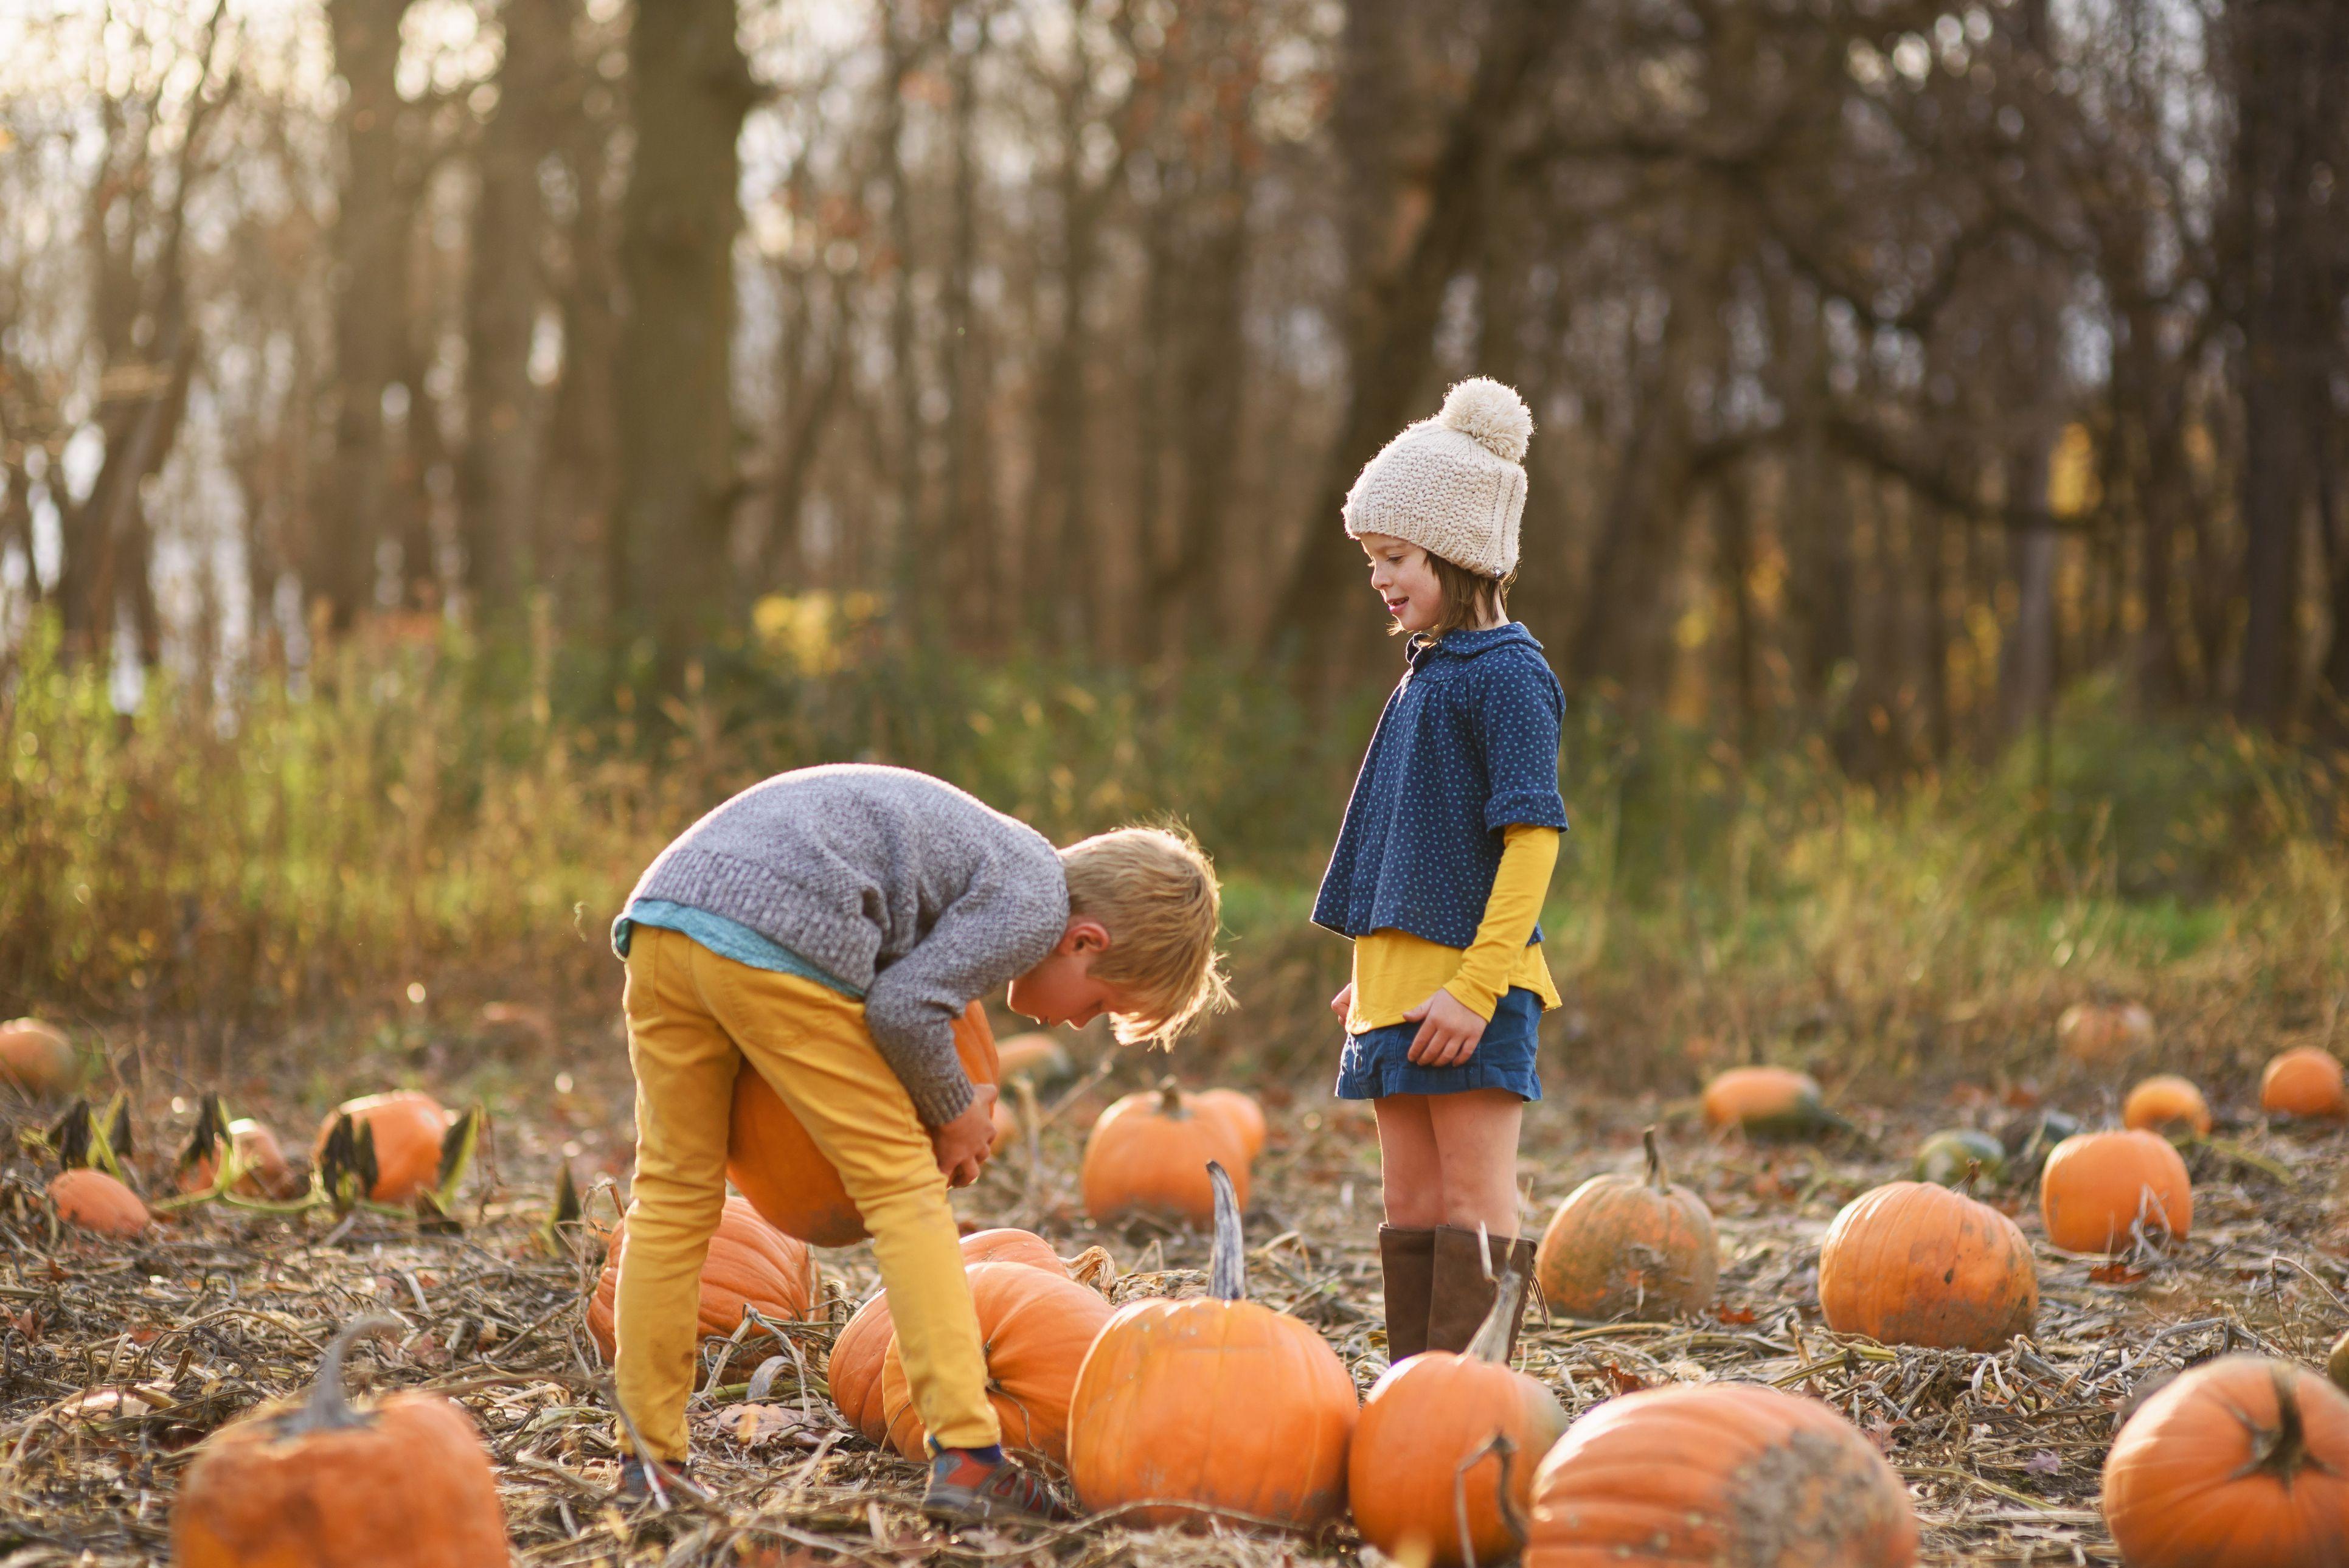 Boy and girl picking pumpkins in a pumpkin patch